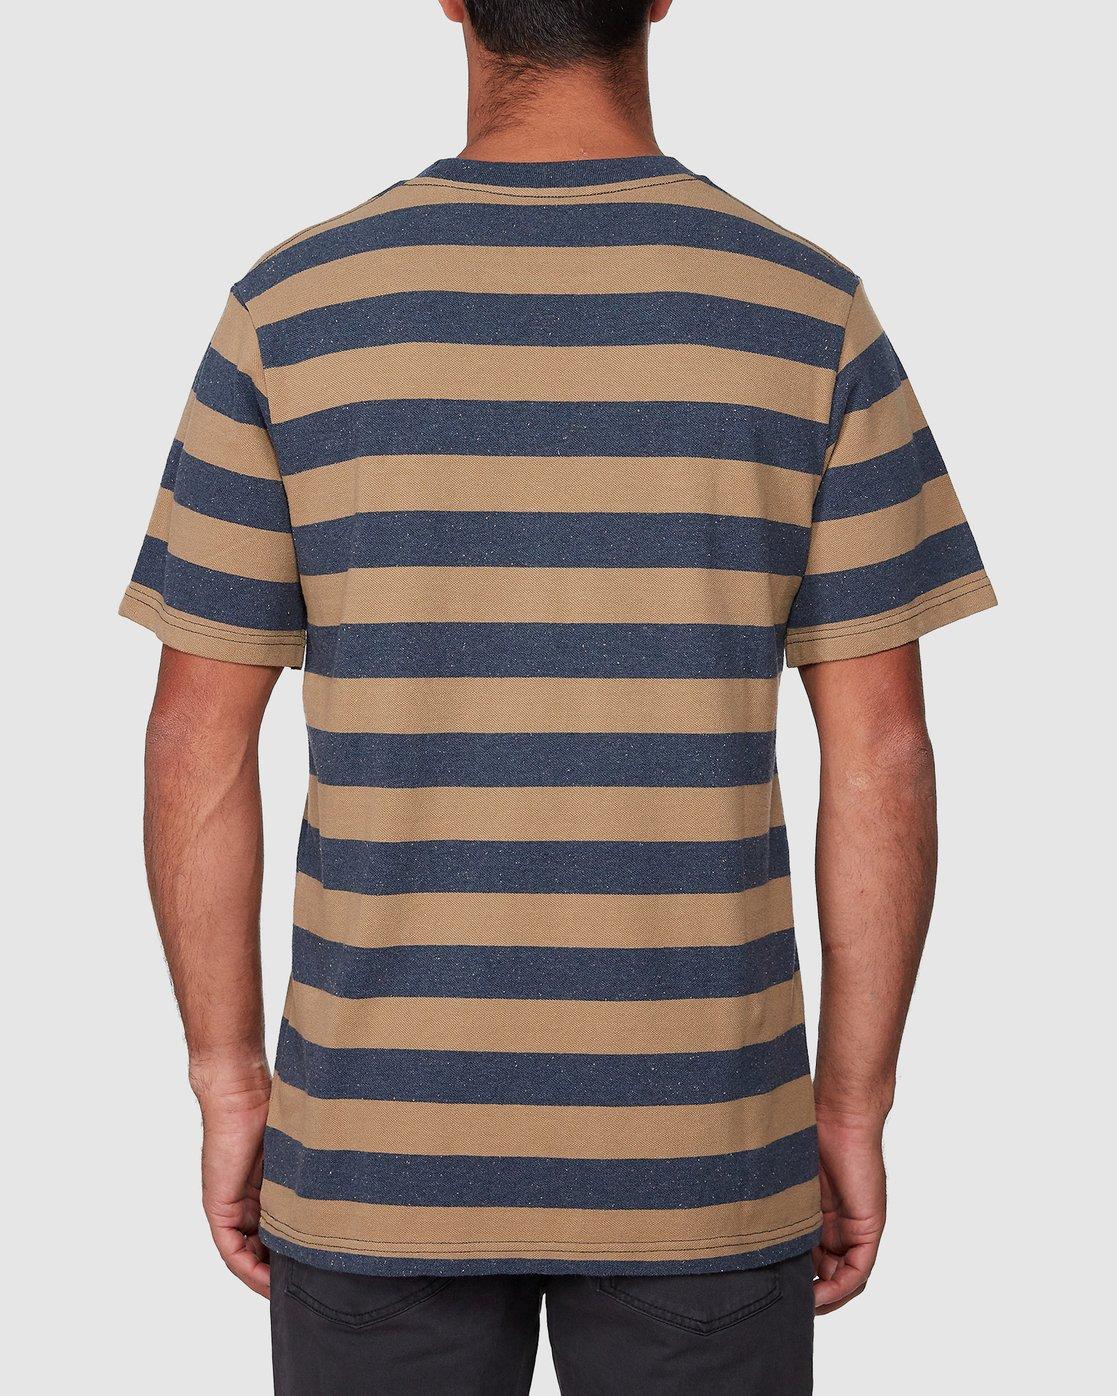 3 Shallow End Stripe Short Sleeve Tee Blue R107063 RVCA